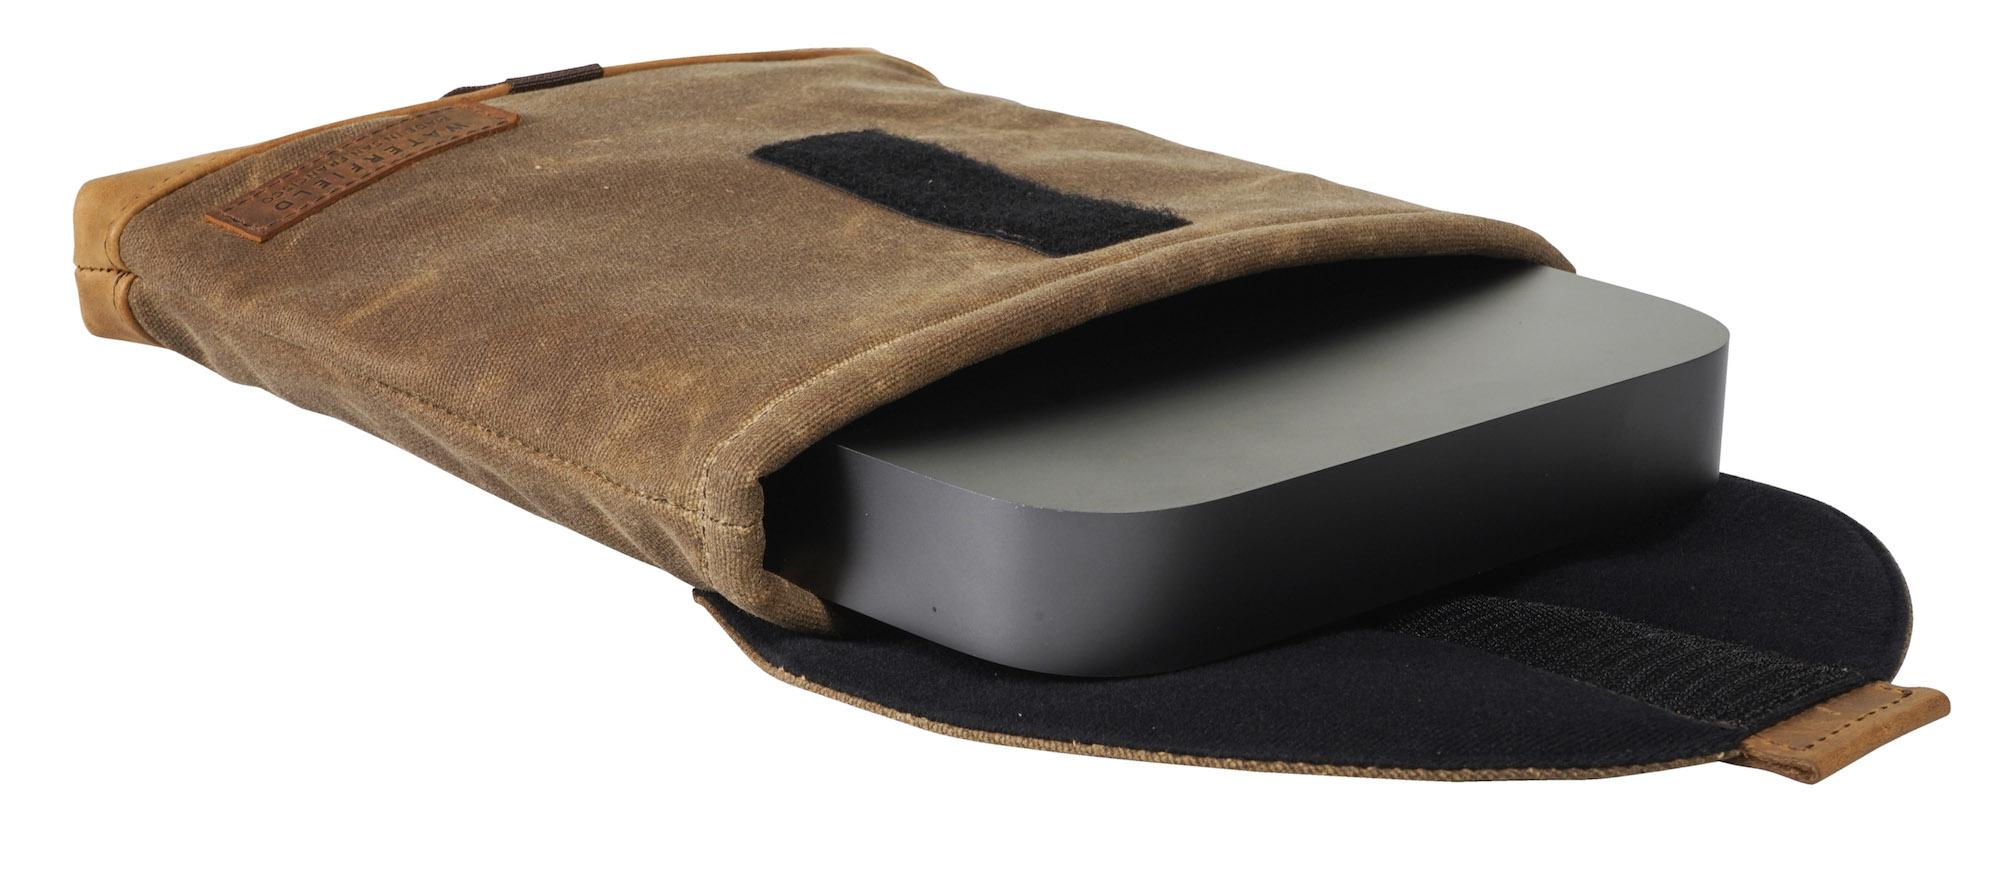 New Mac Mini Travel Cases